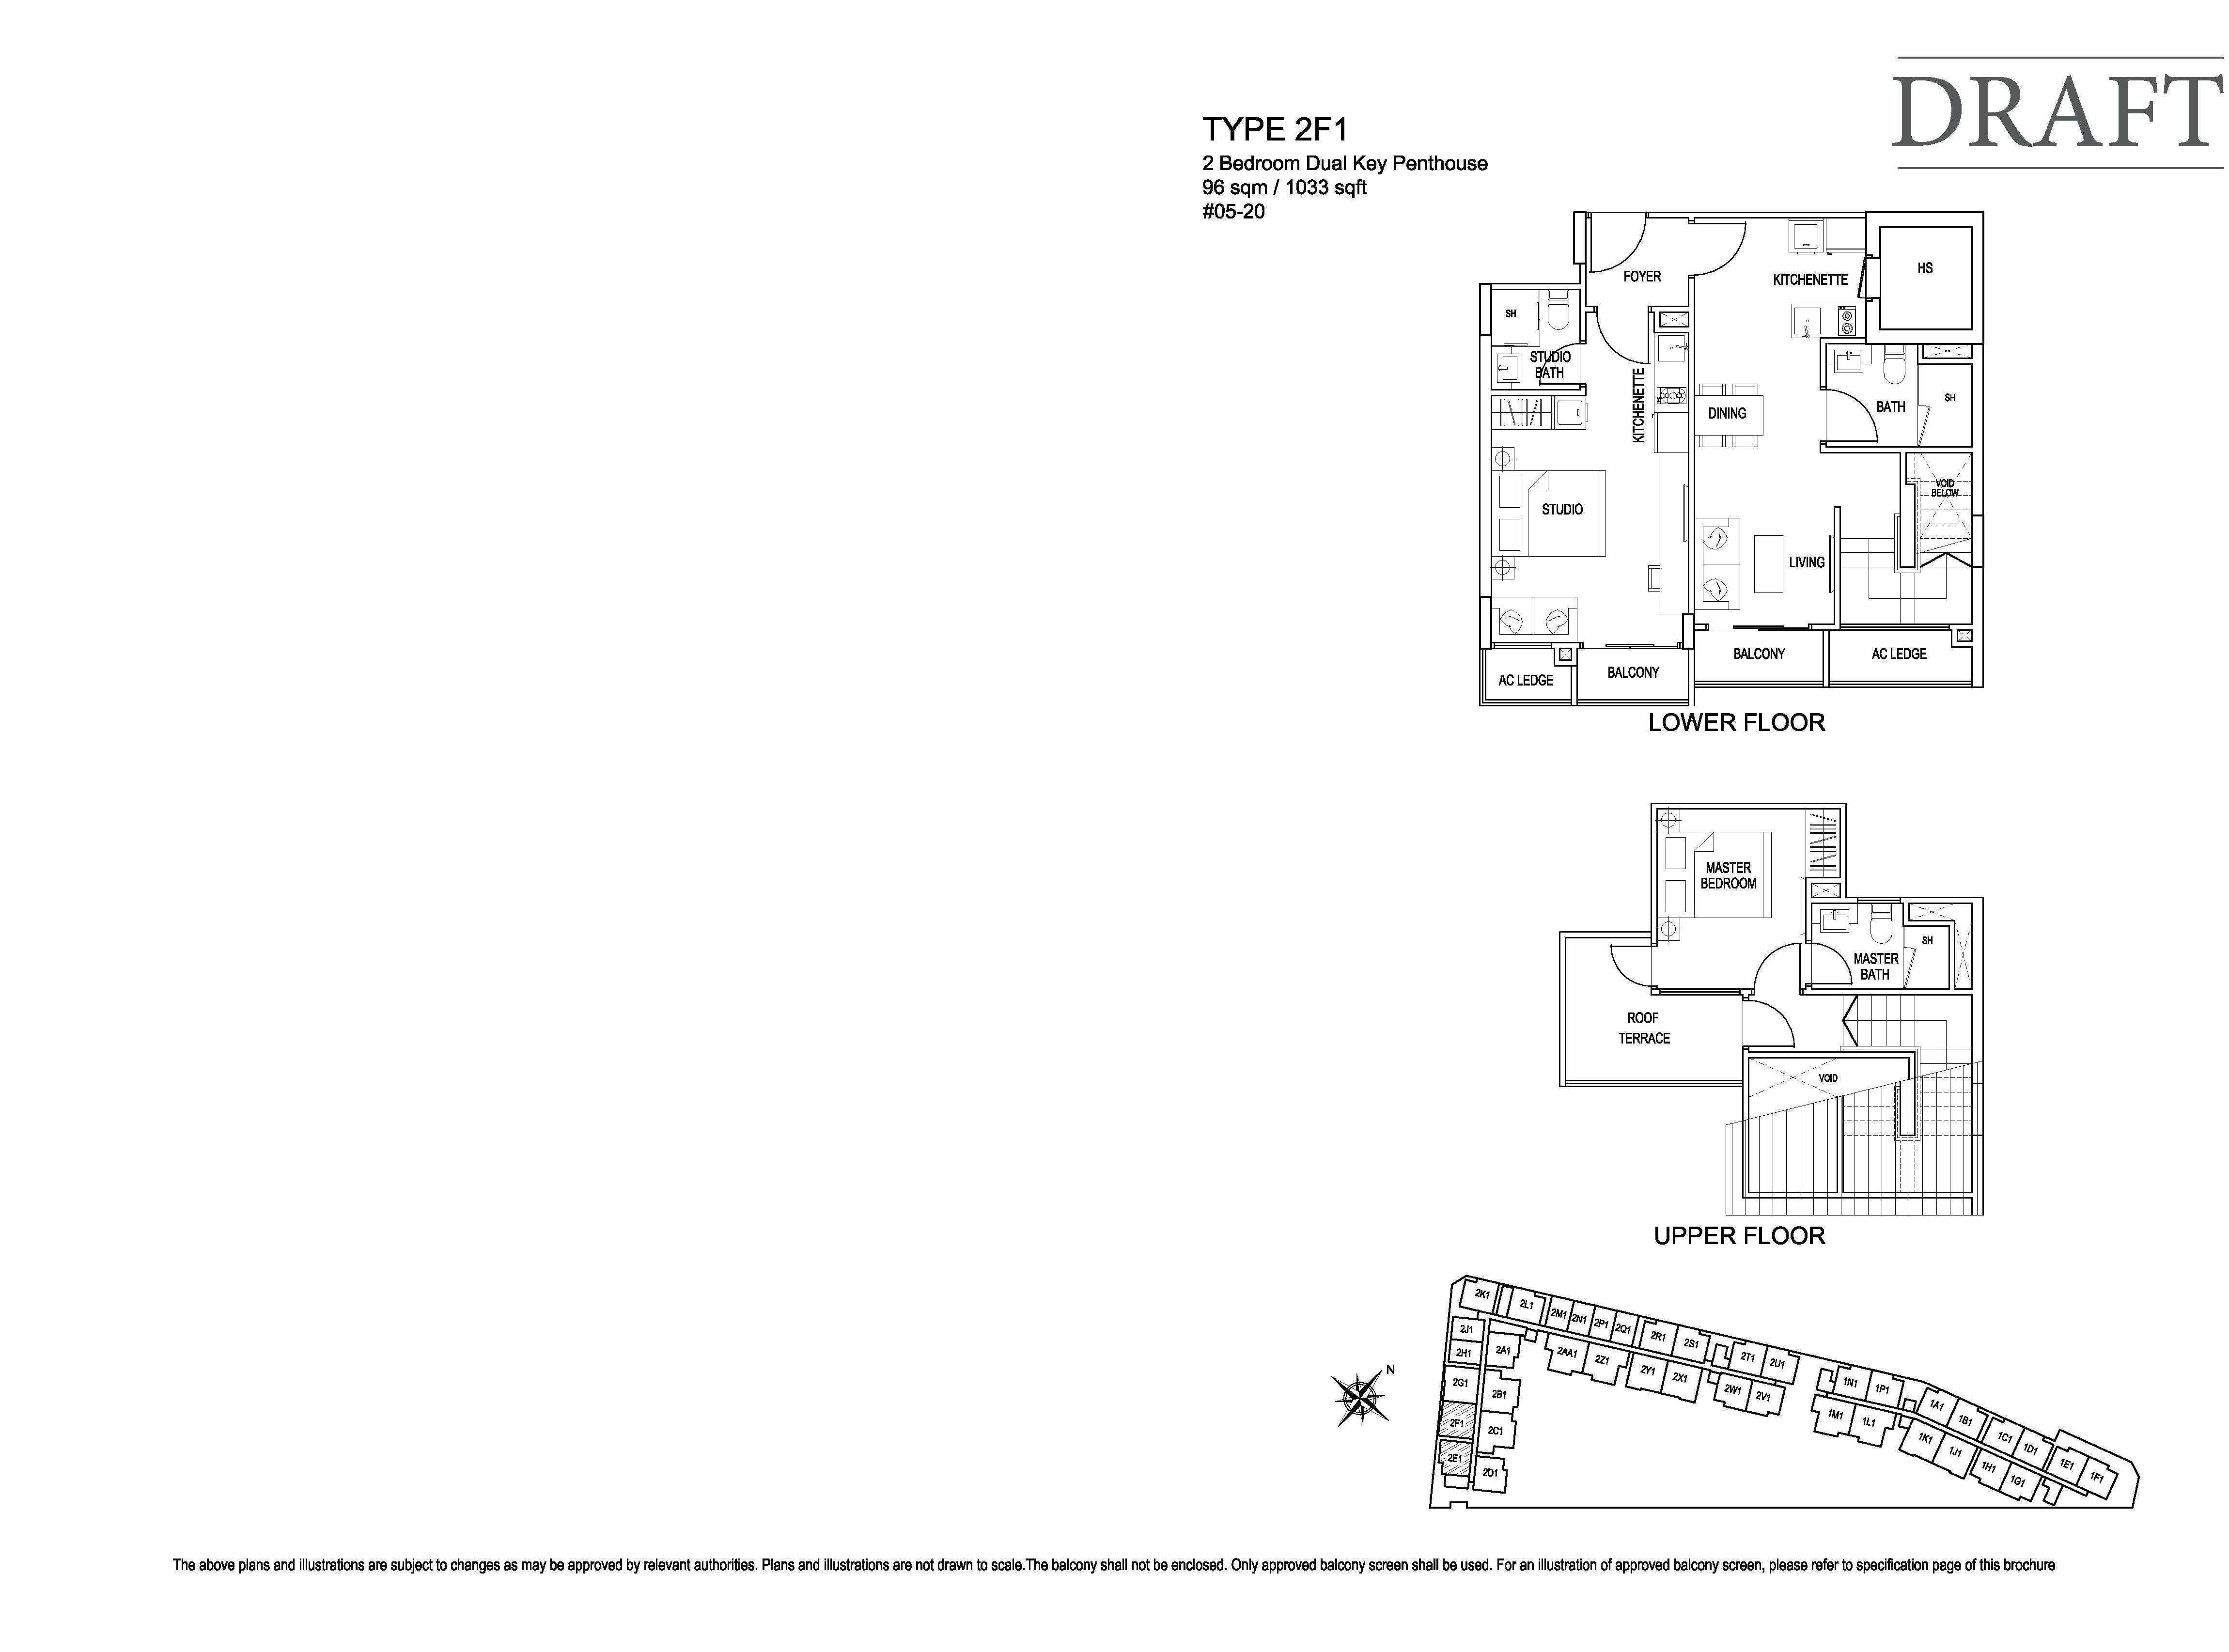 Kensington Square 2 Bedroom Dual Key Penthouse Floor Plans Type 2F1